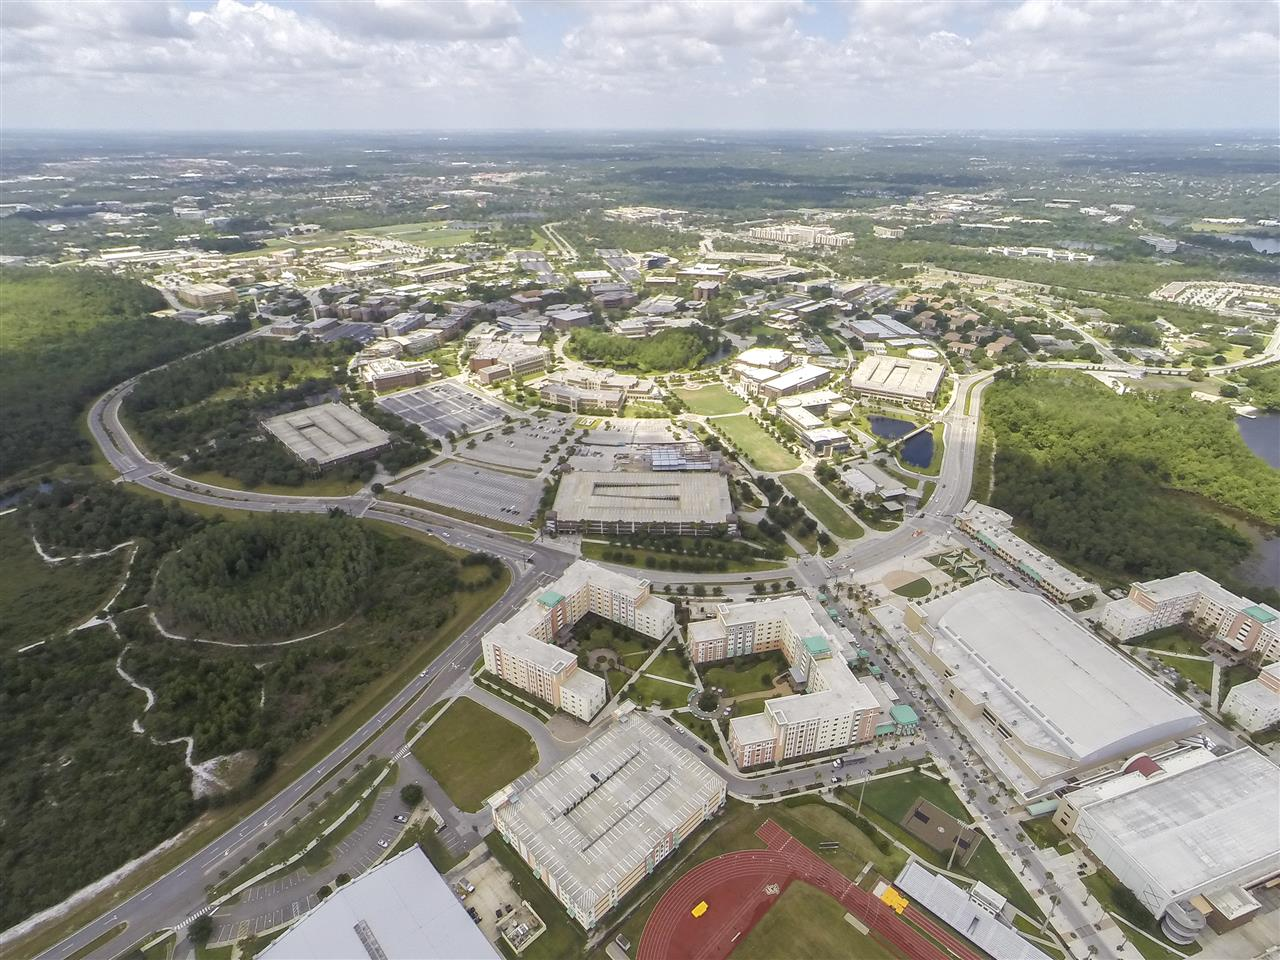 #Orlando,FL #UniversityofCentralFlorida #UCF #UCFAerial